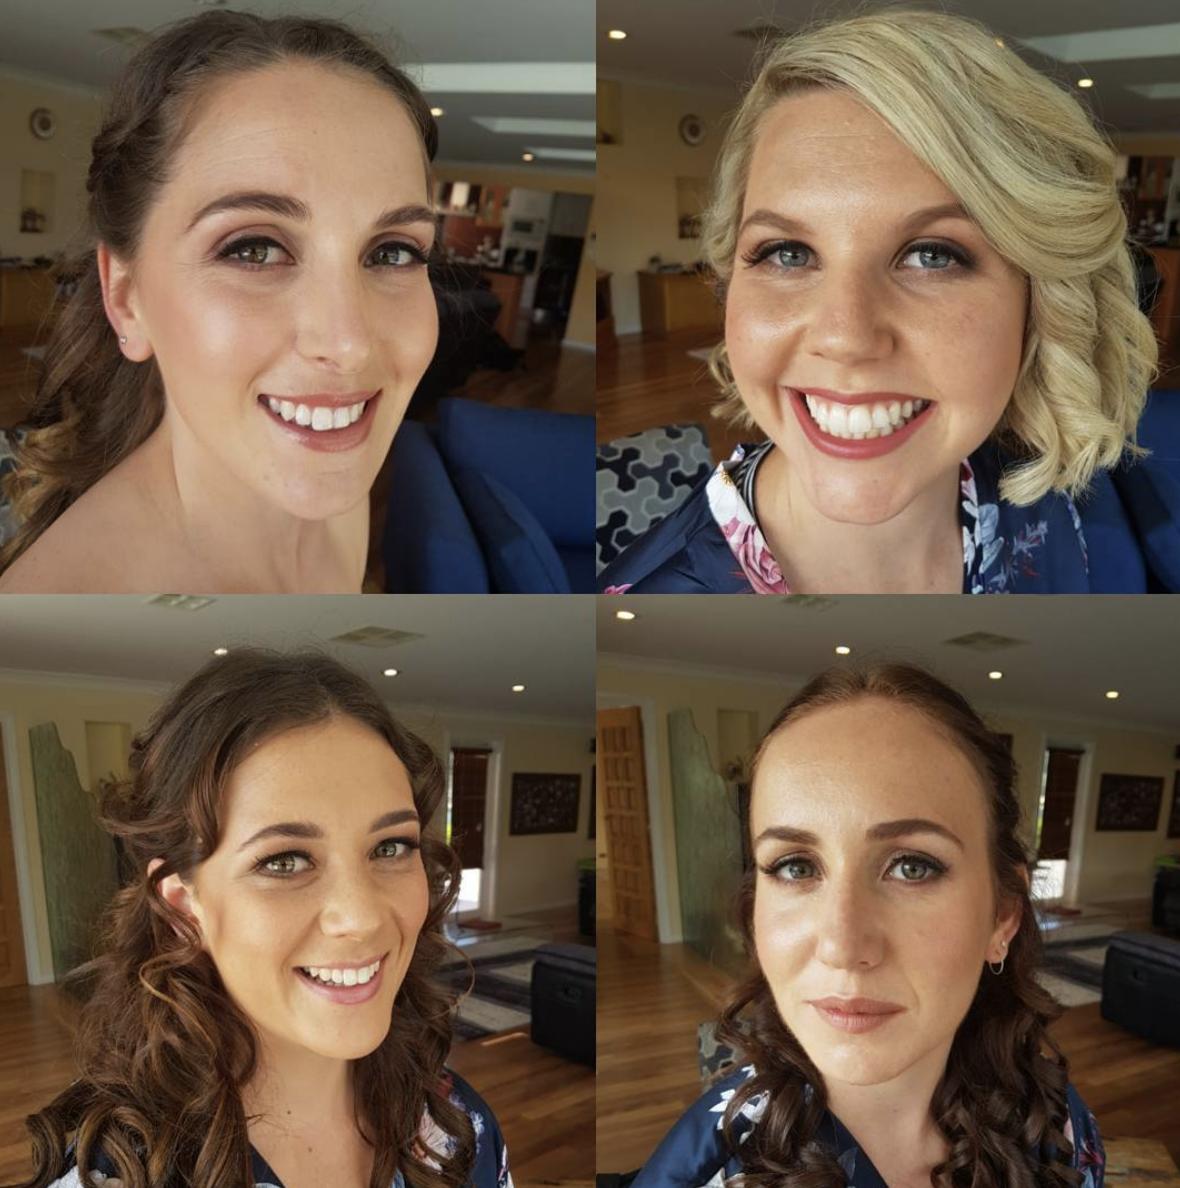 Wedding party makeup, bride and bridesmaids.